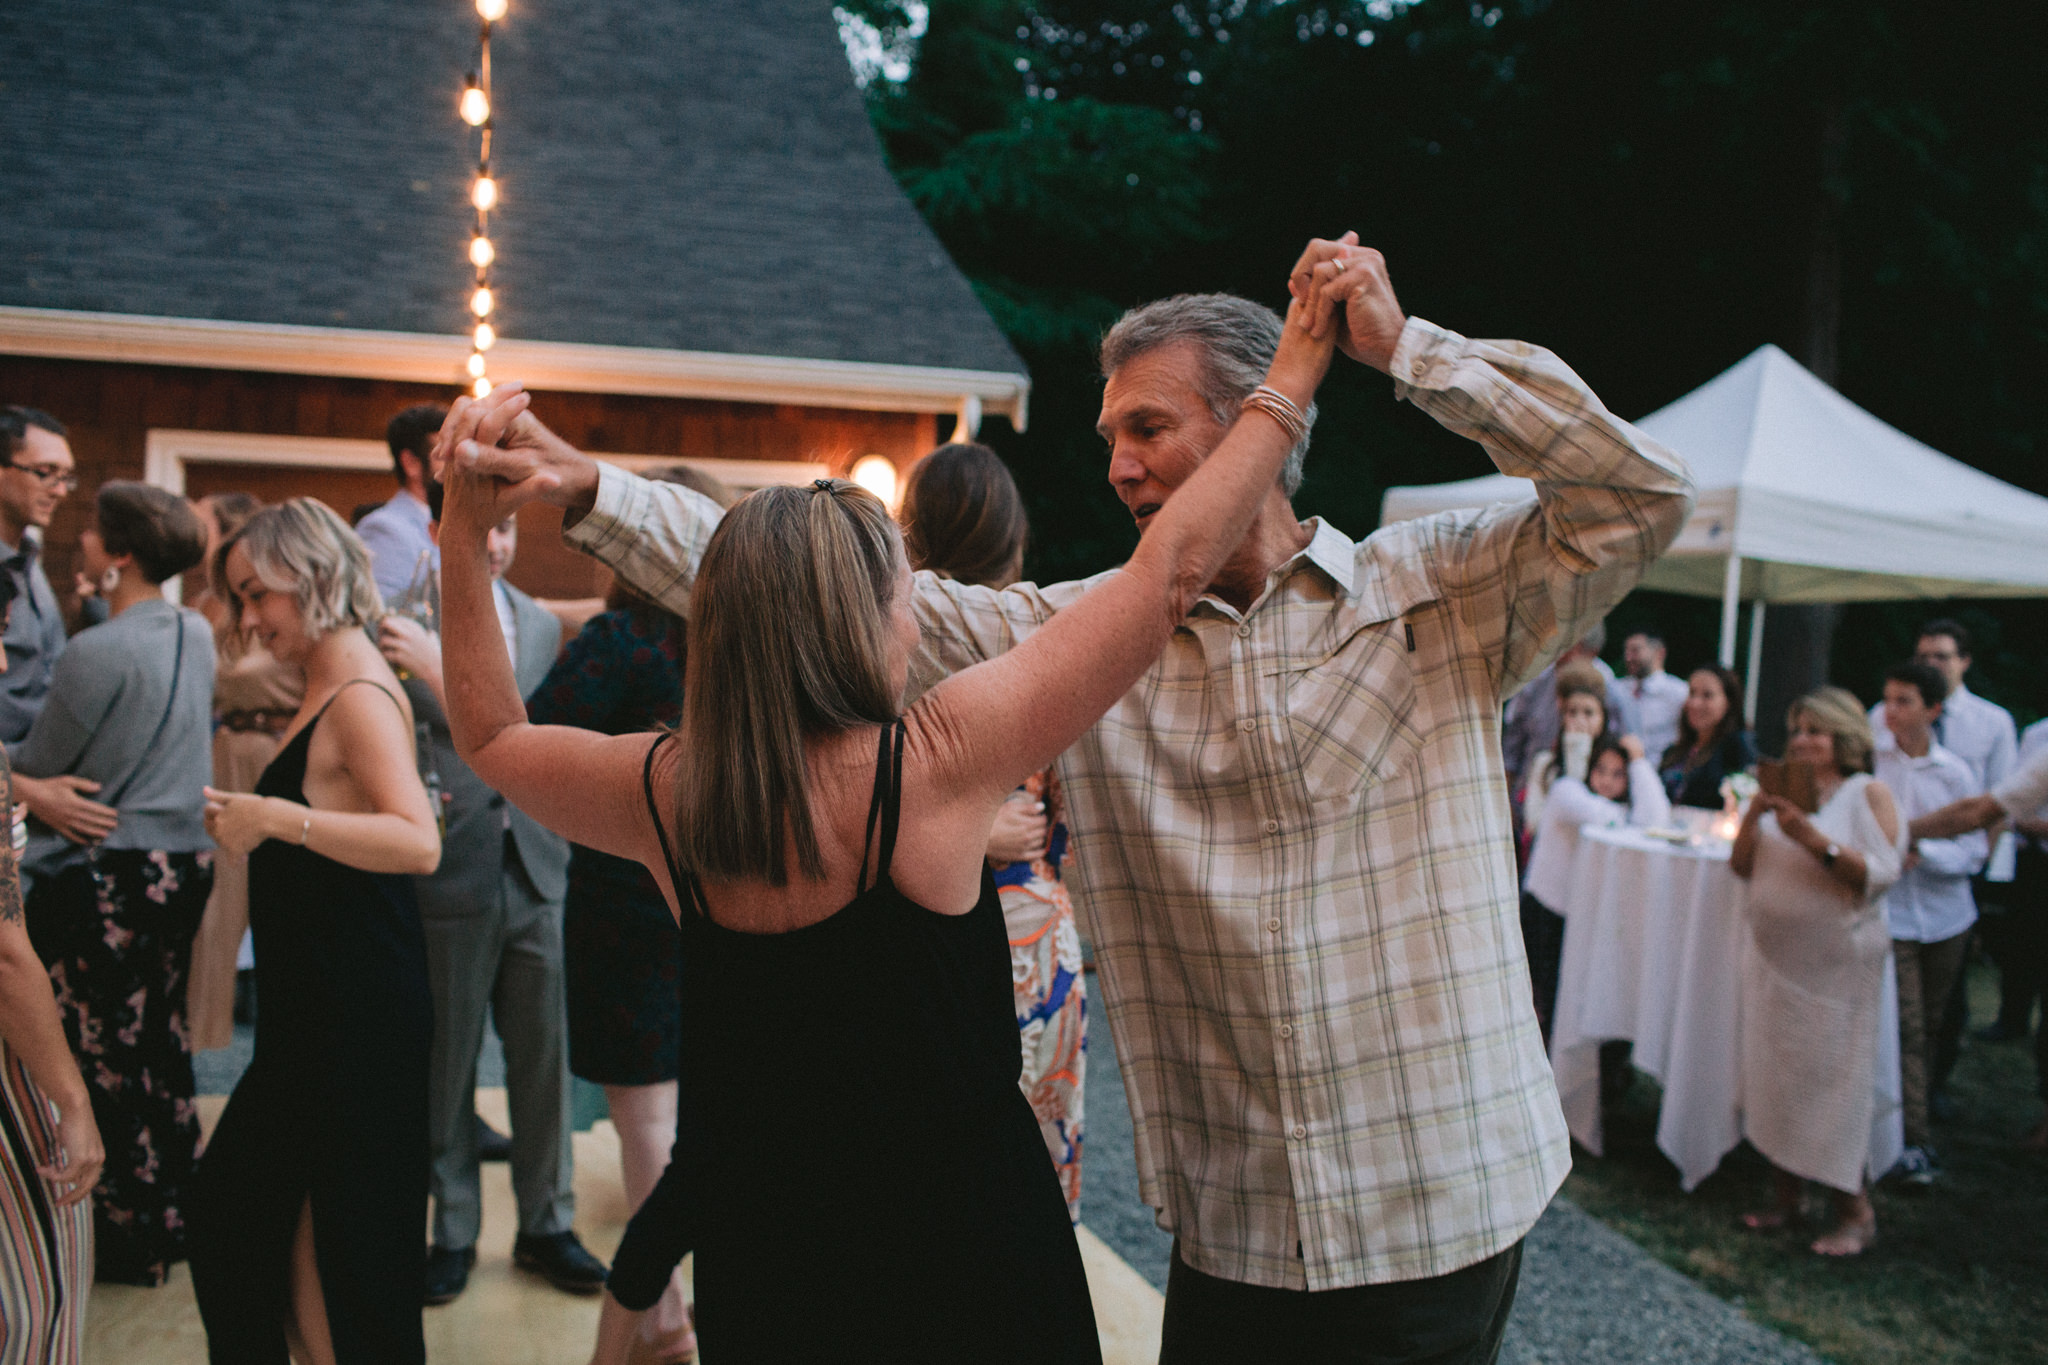 Backyard-Bainbridge-Island-Wedding-Alycia-Lovell-Photography-237.JPG